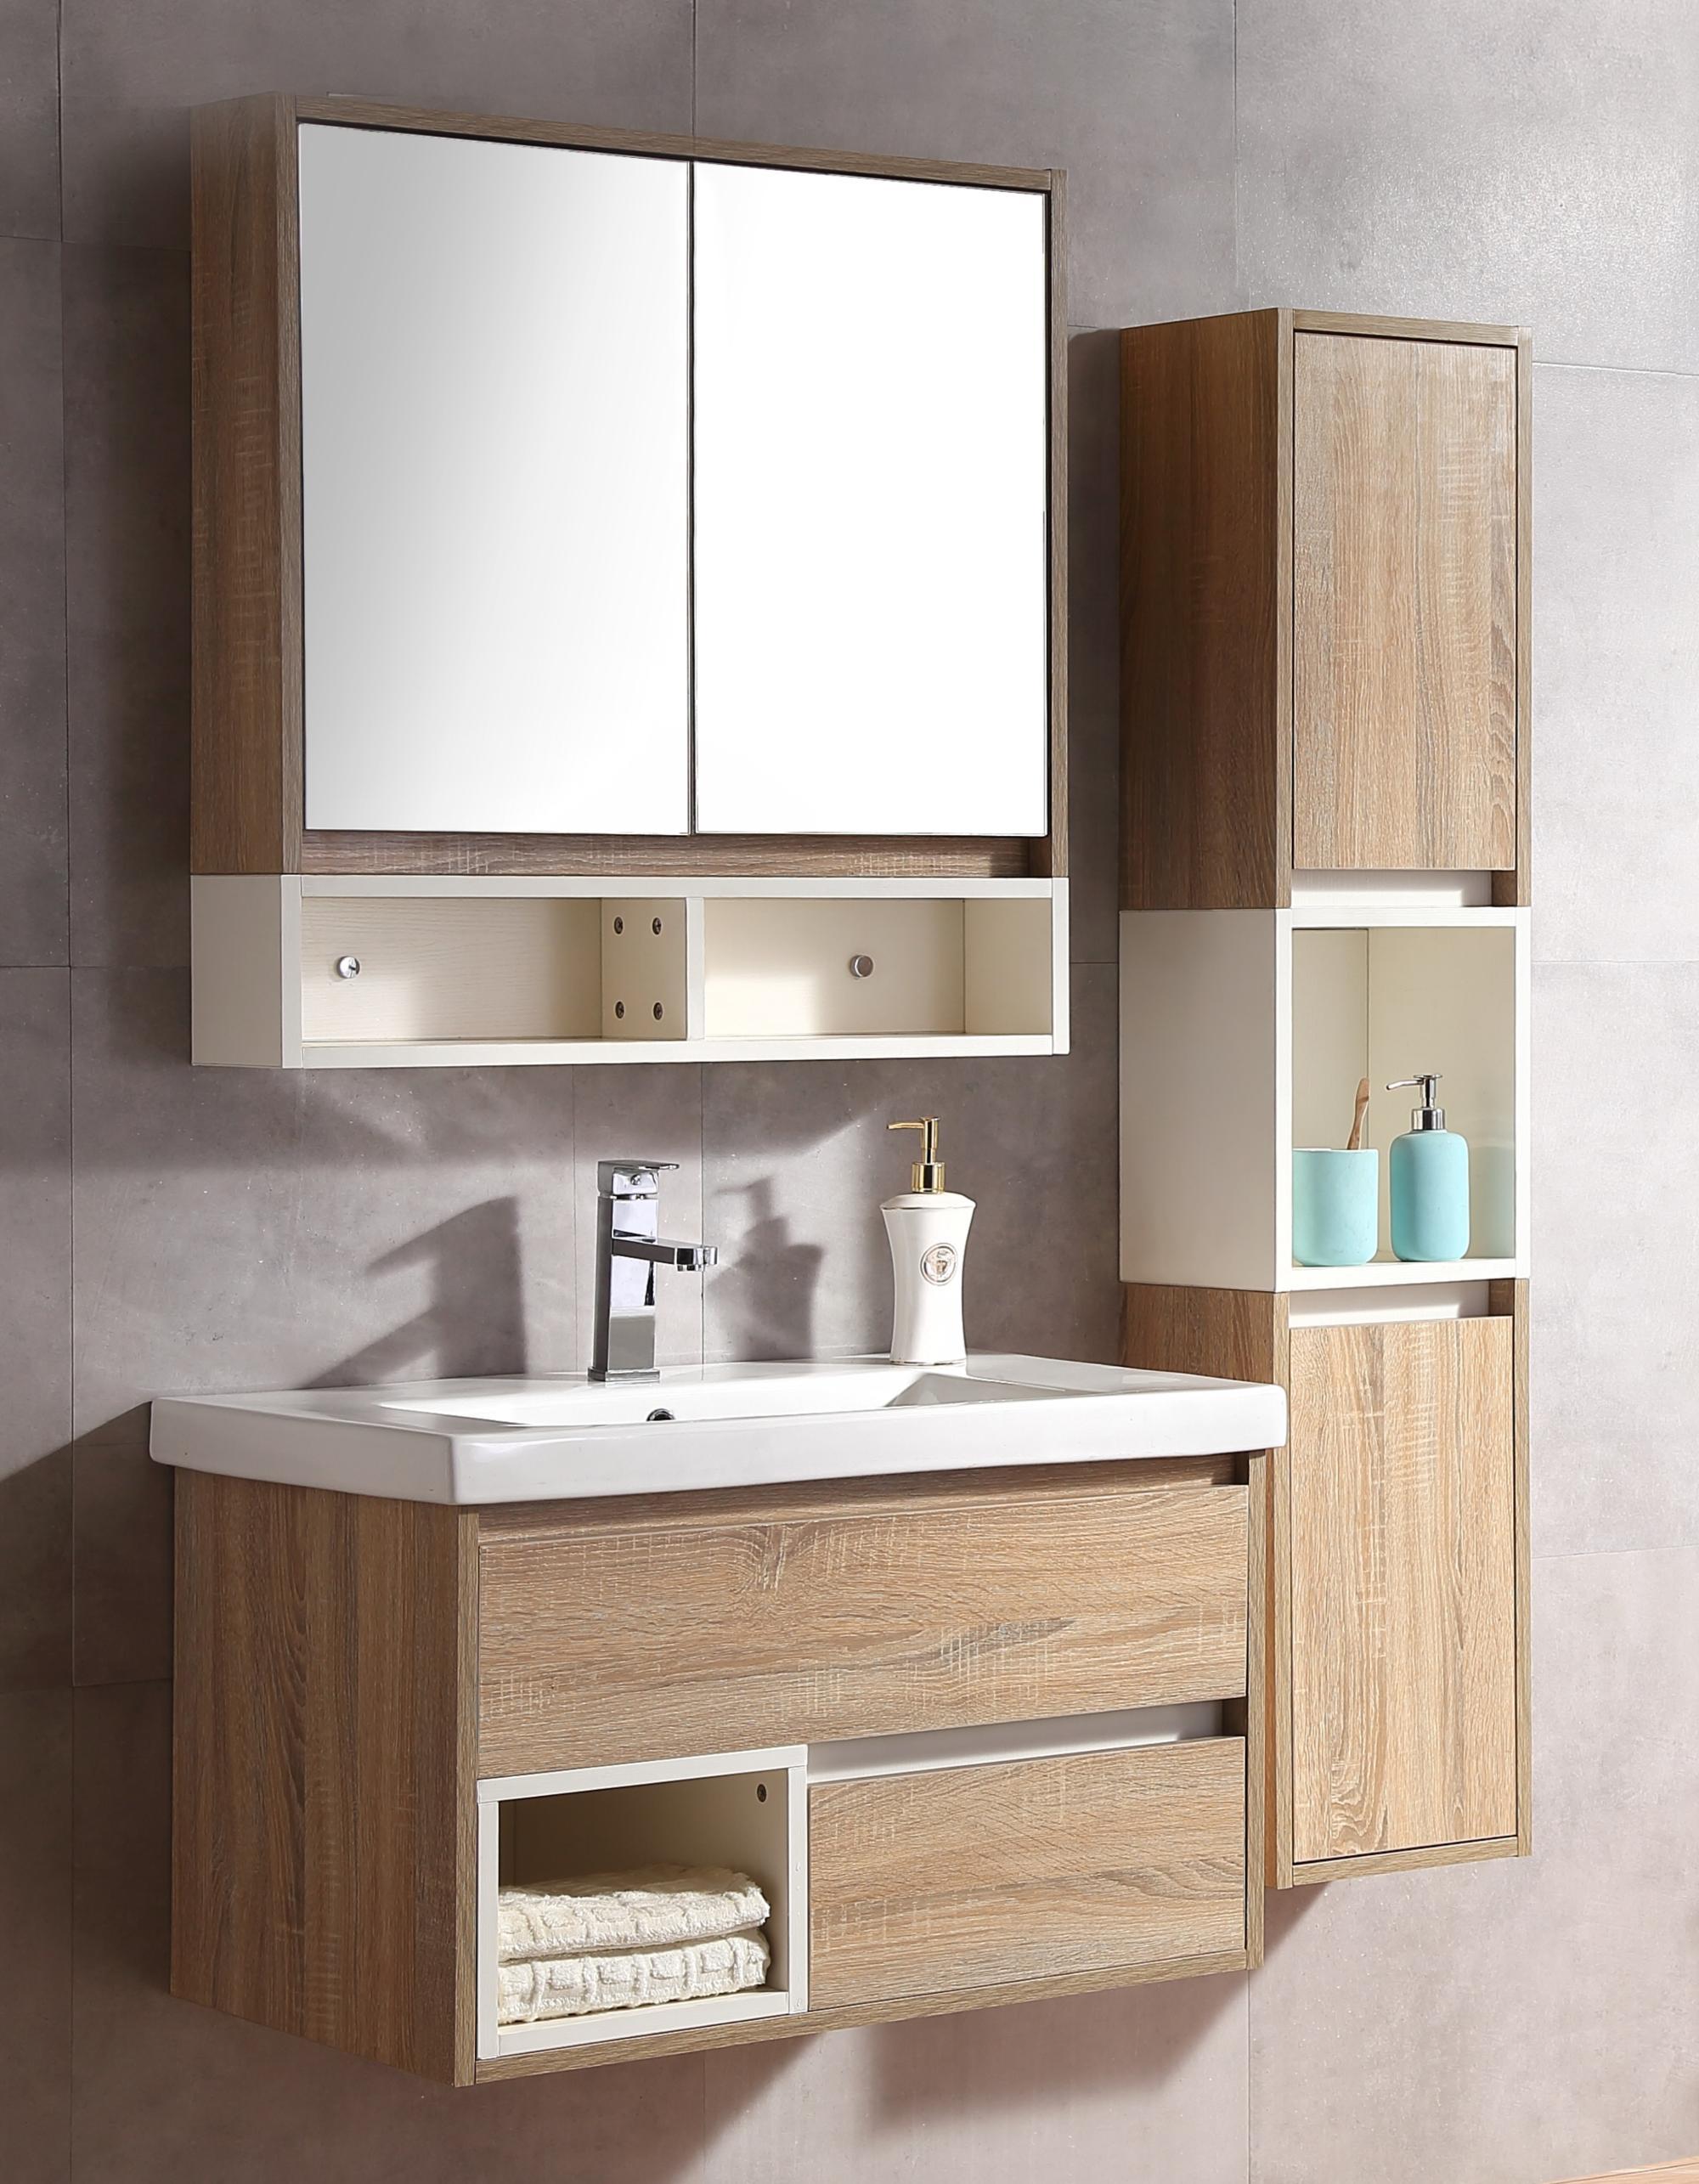 32 Double Sink Bathroom Vanity Set Floating Bath Cabinet With Mirror And Shelf Buy Bathrooms Cabinet With Double Sink Floating Bath Cabinet Bath Cabinet With Wall Shelf Product On Alibaba Com